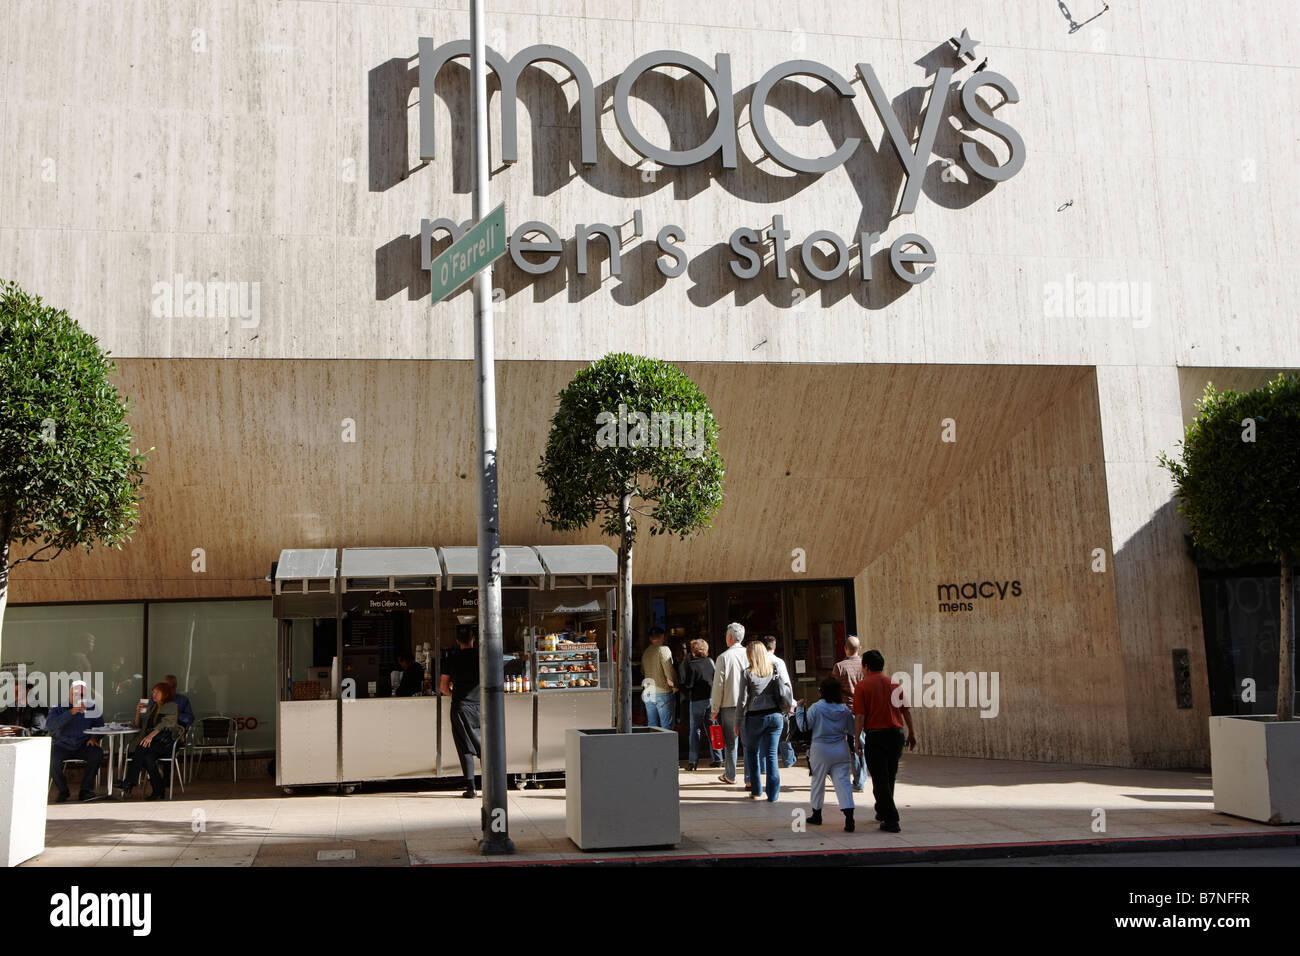 c7e9ccbfd6b1 People entering Macy's men's store. San Francisco, California, USA.